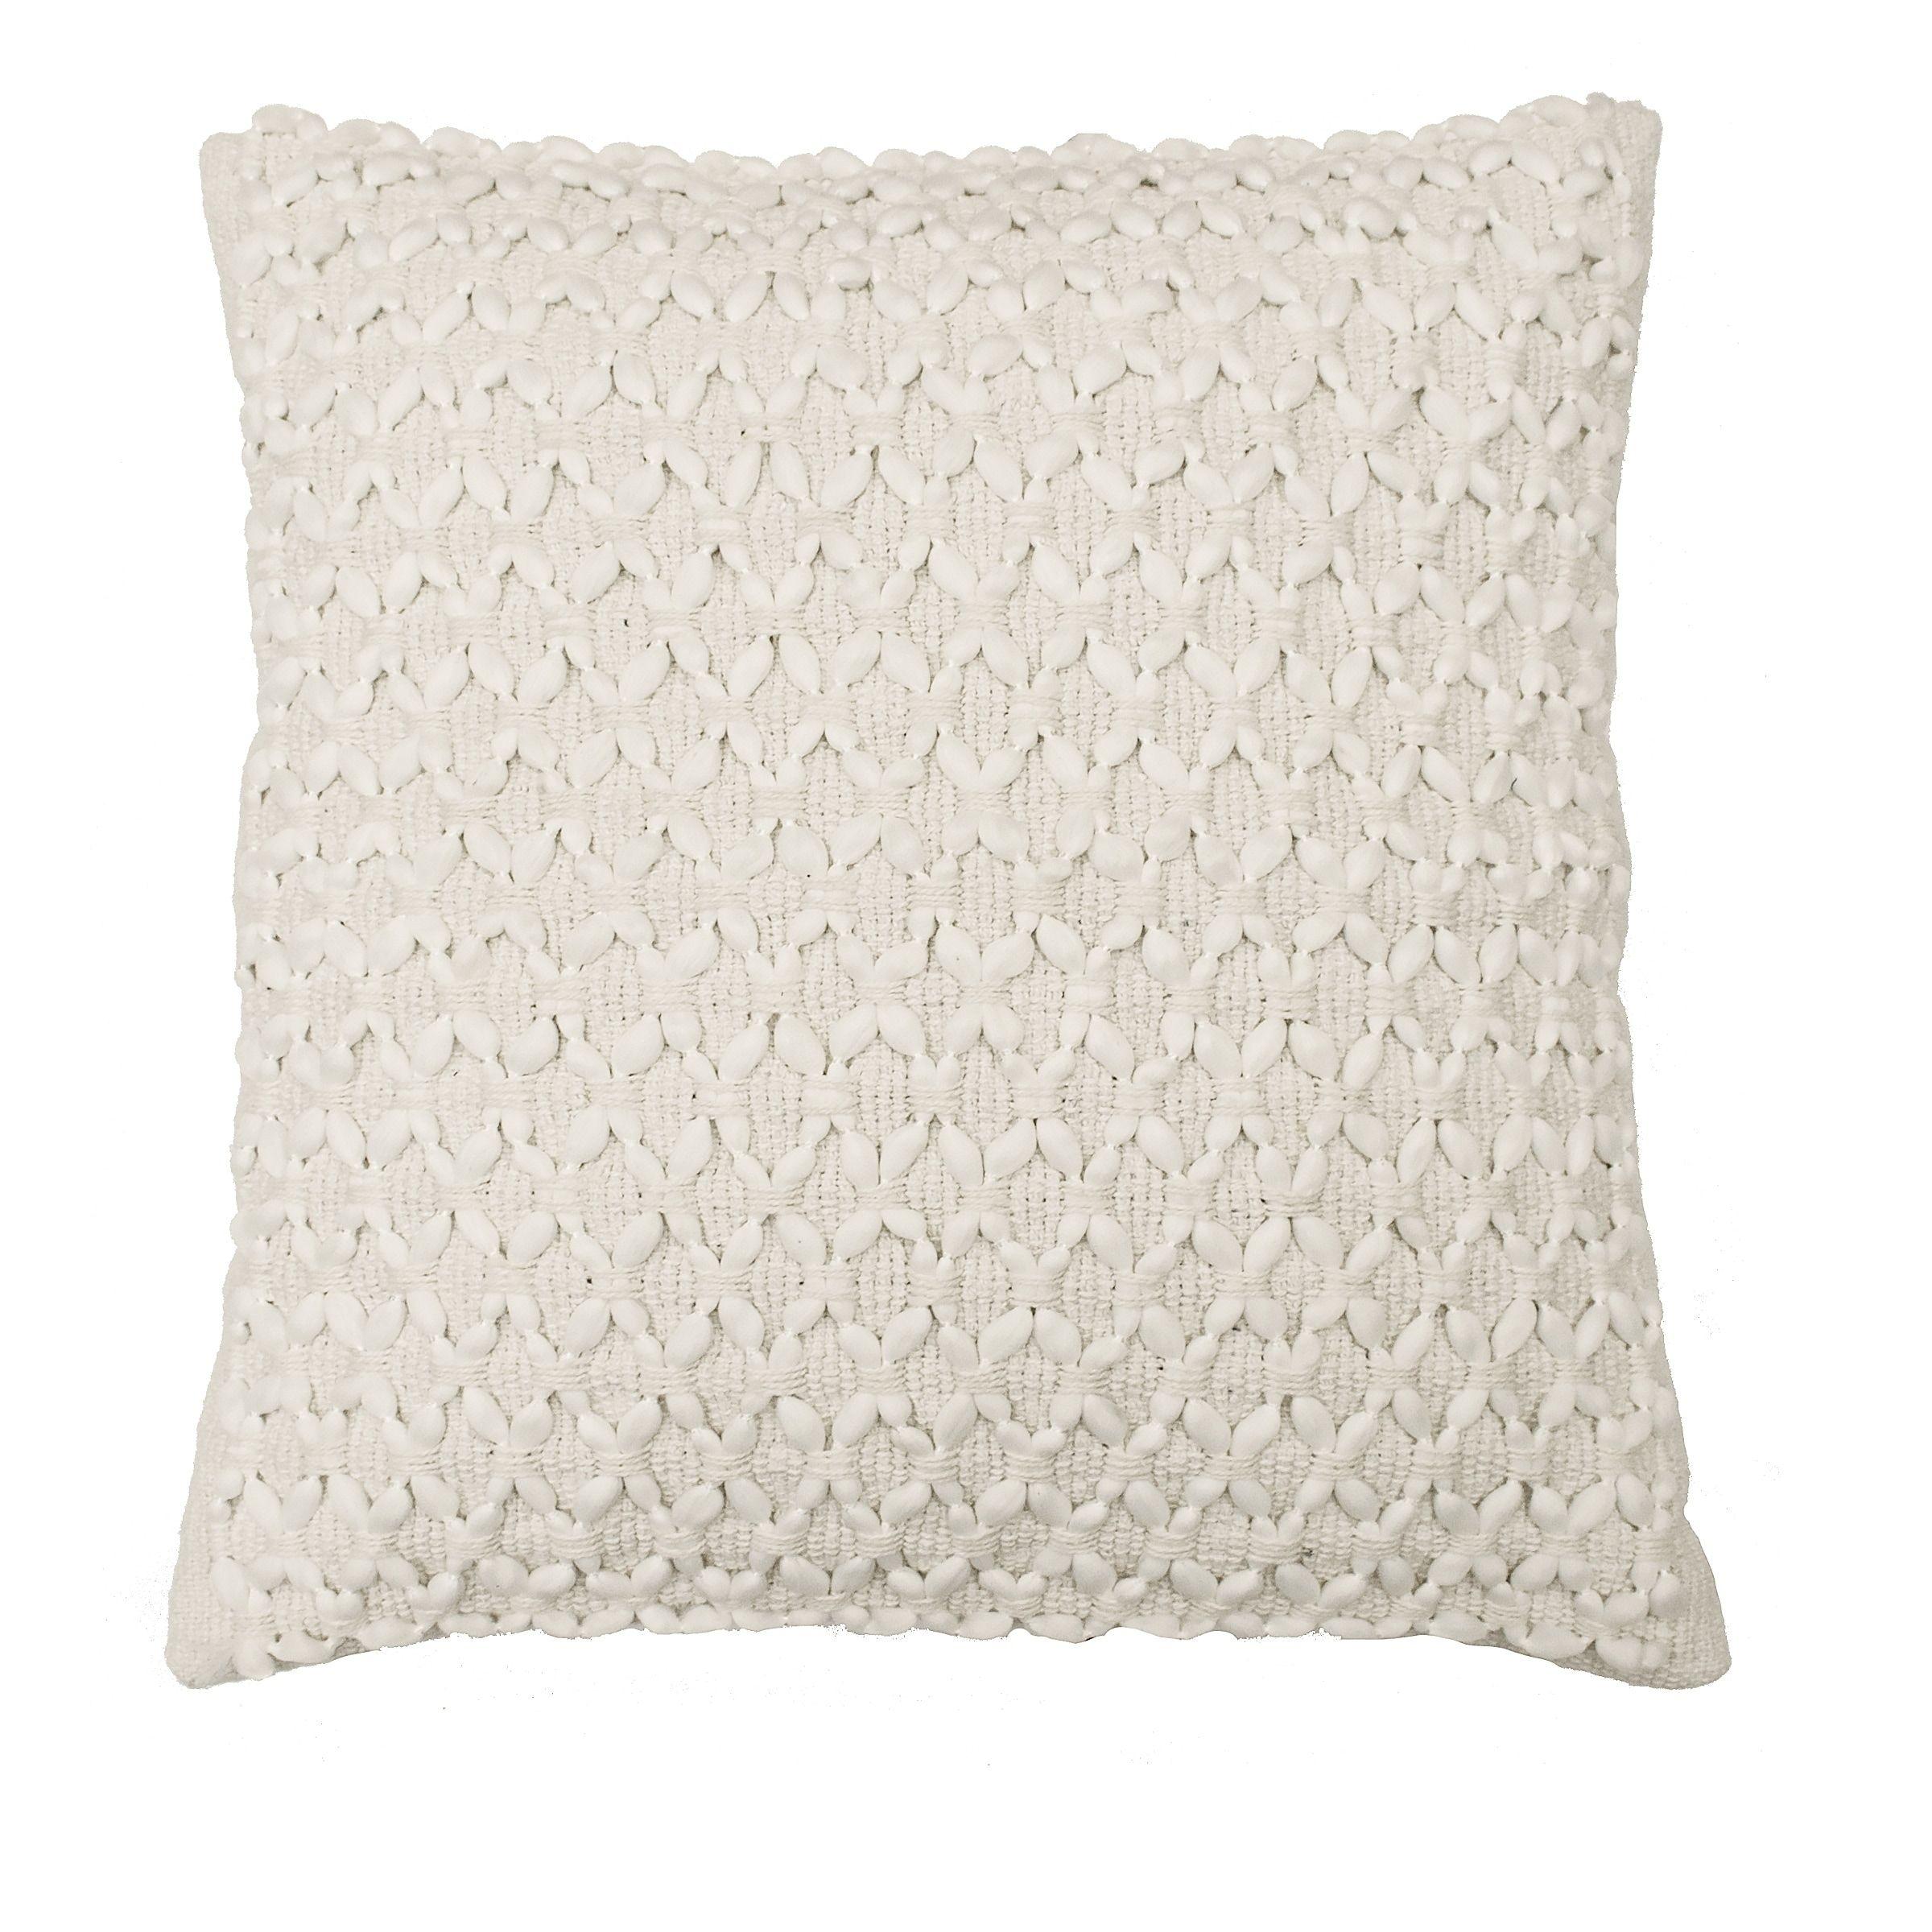 Beautyrest laurel woven embellishment decorative pillow ivory